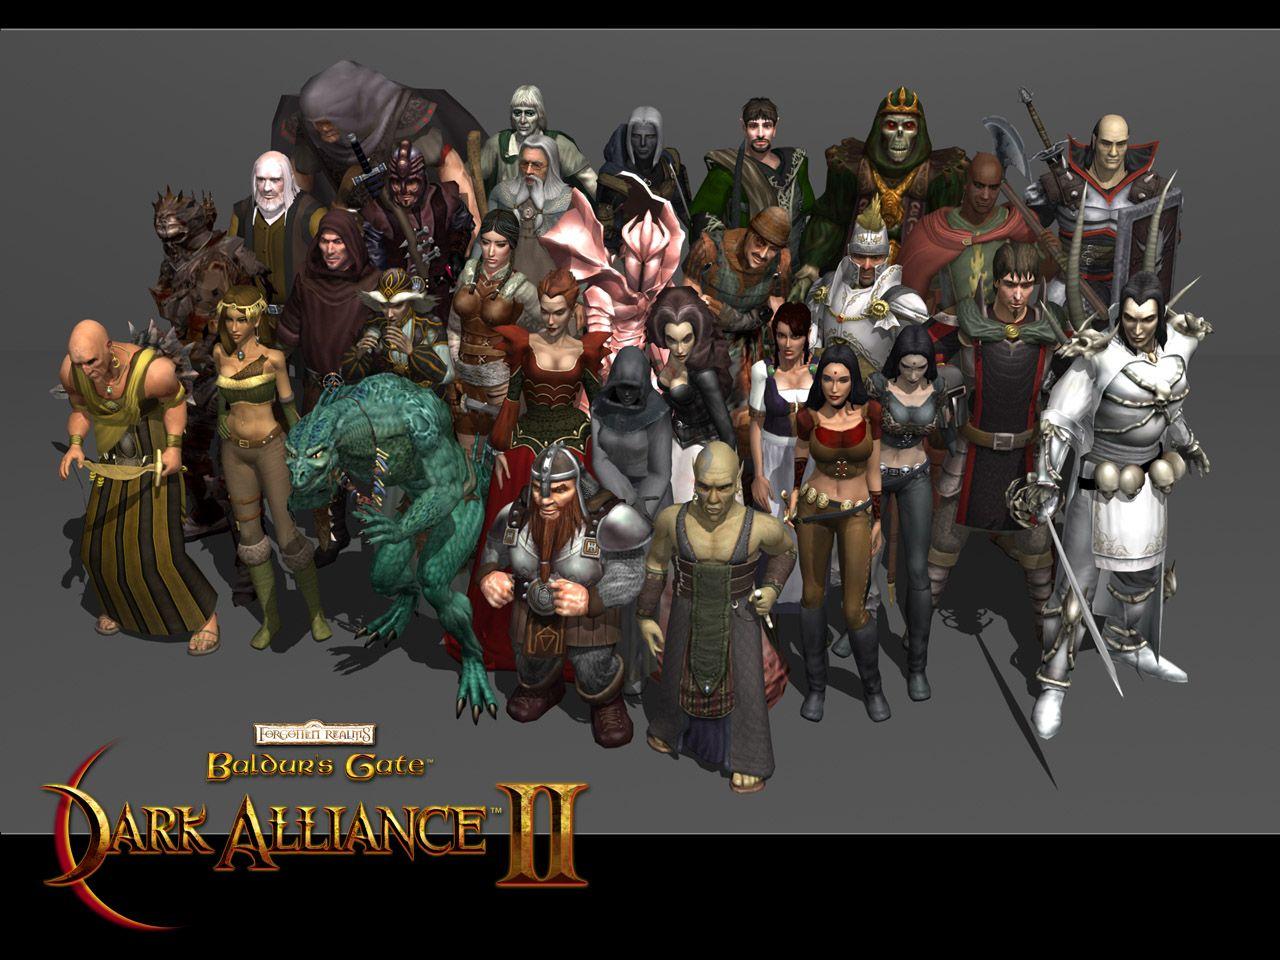 Baldur S Gate Dark Alliance Ii With Images Star Fox Baldur S